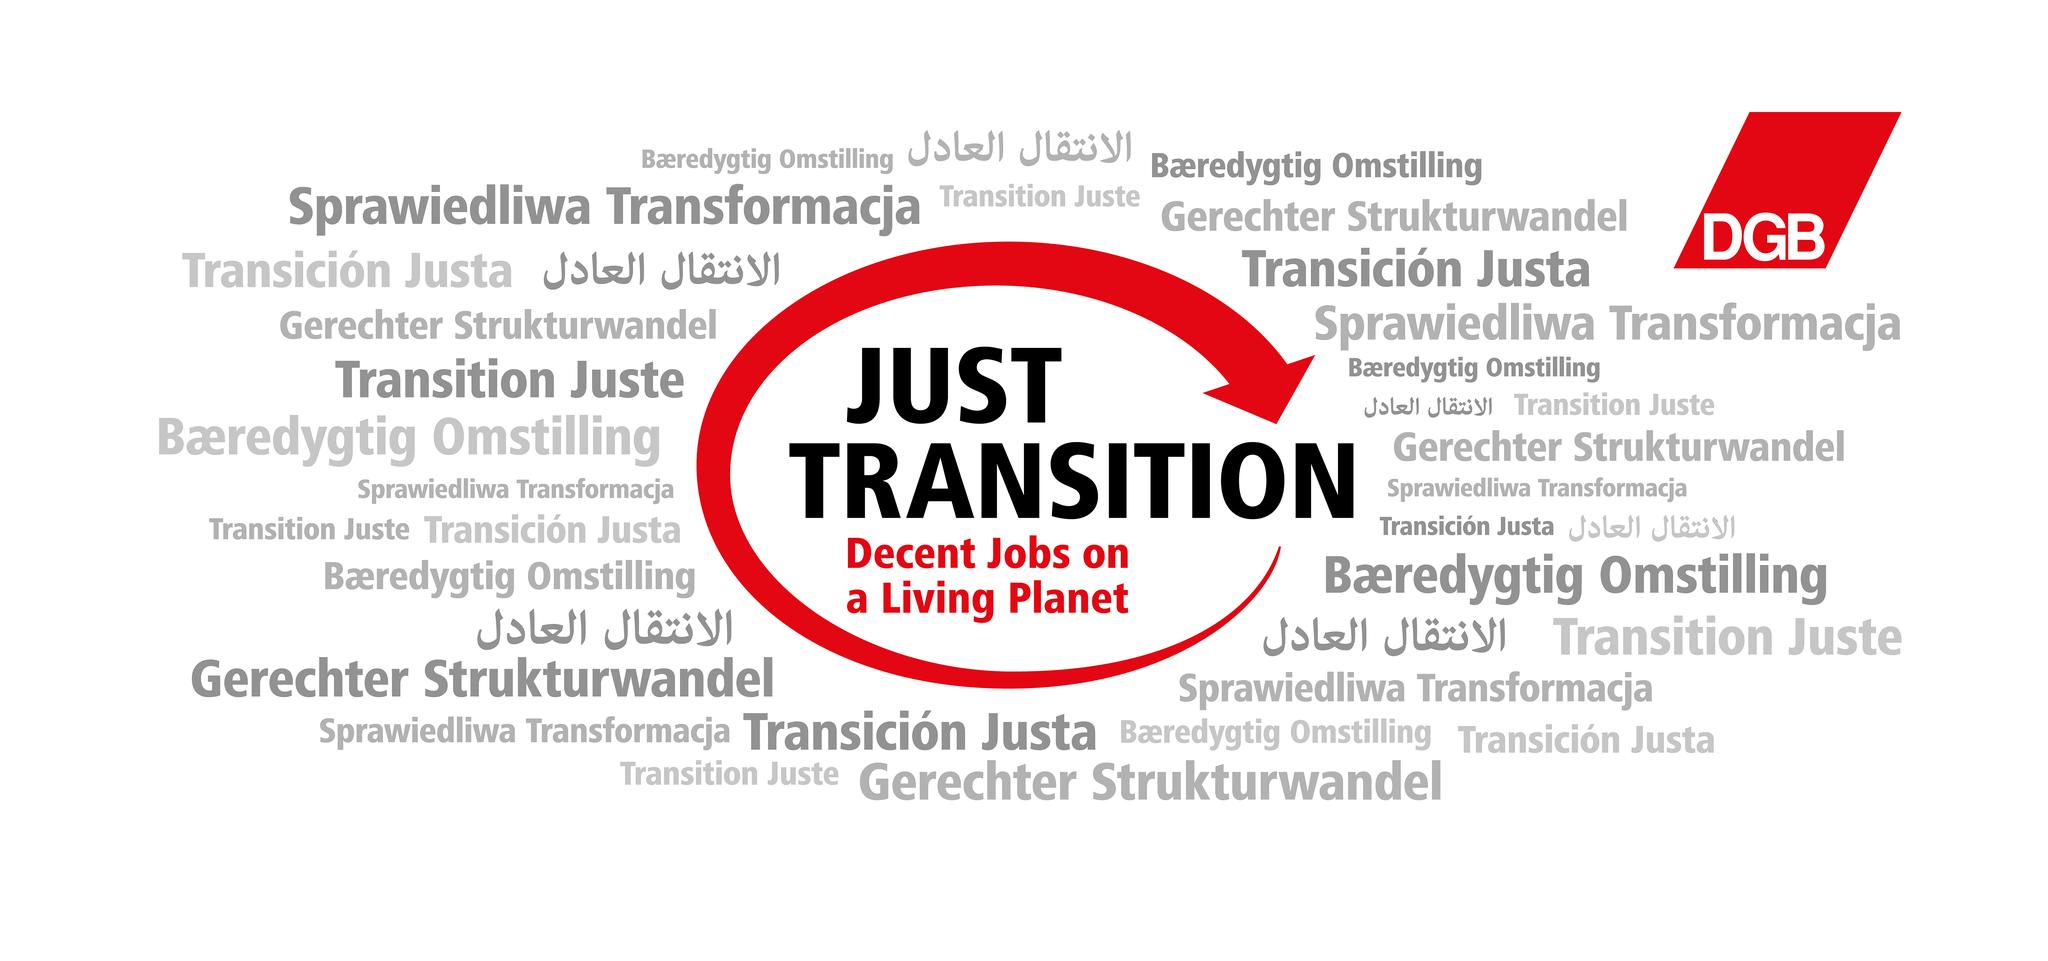 Logoabbildung: Gerechter Strukturwandel Just Transition Decent Jobs on a Living Planet mit rotem Pfeil umrundet